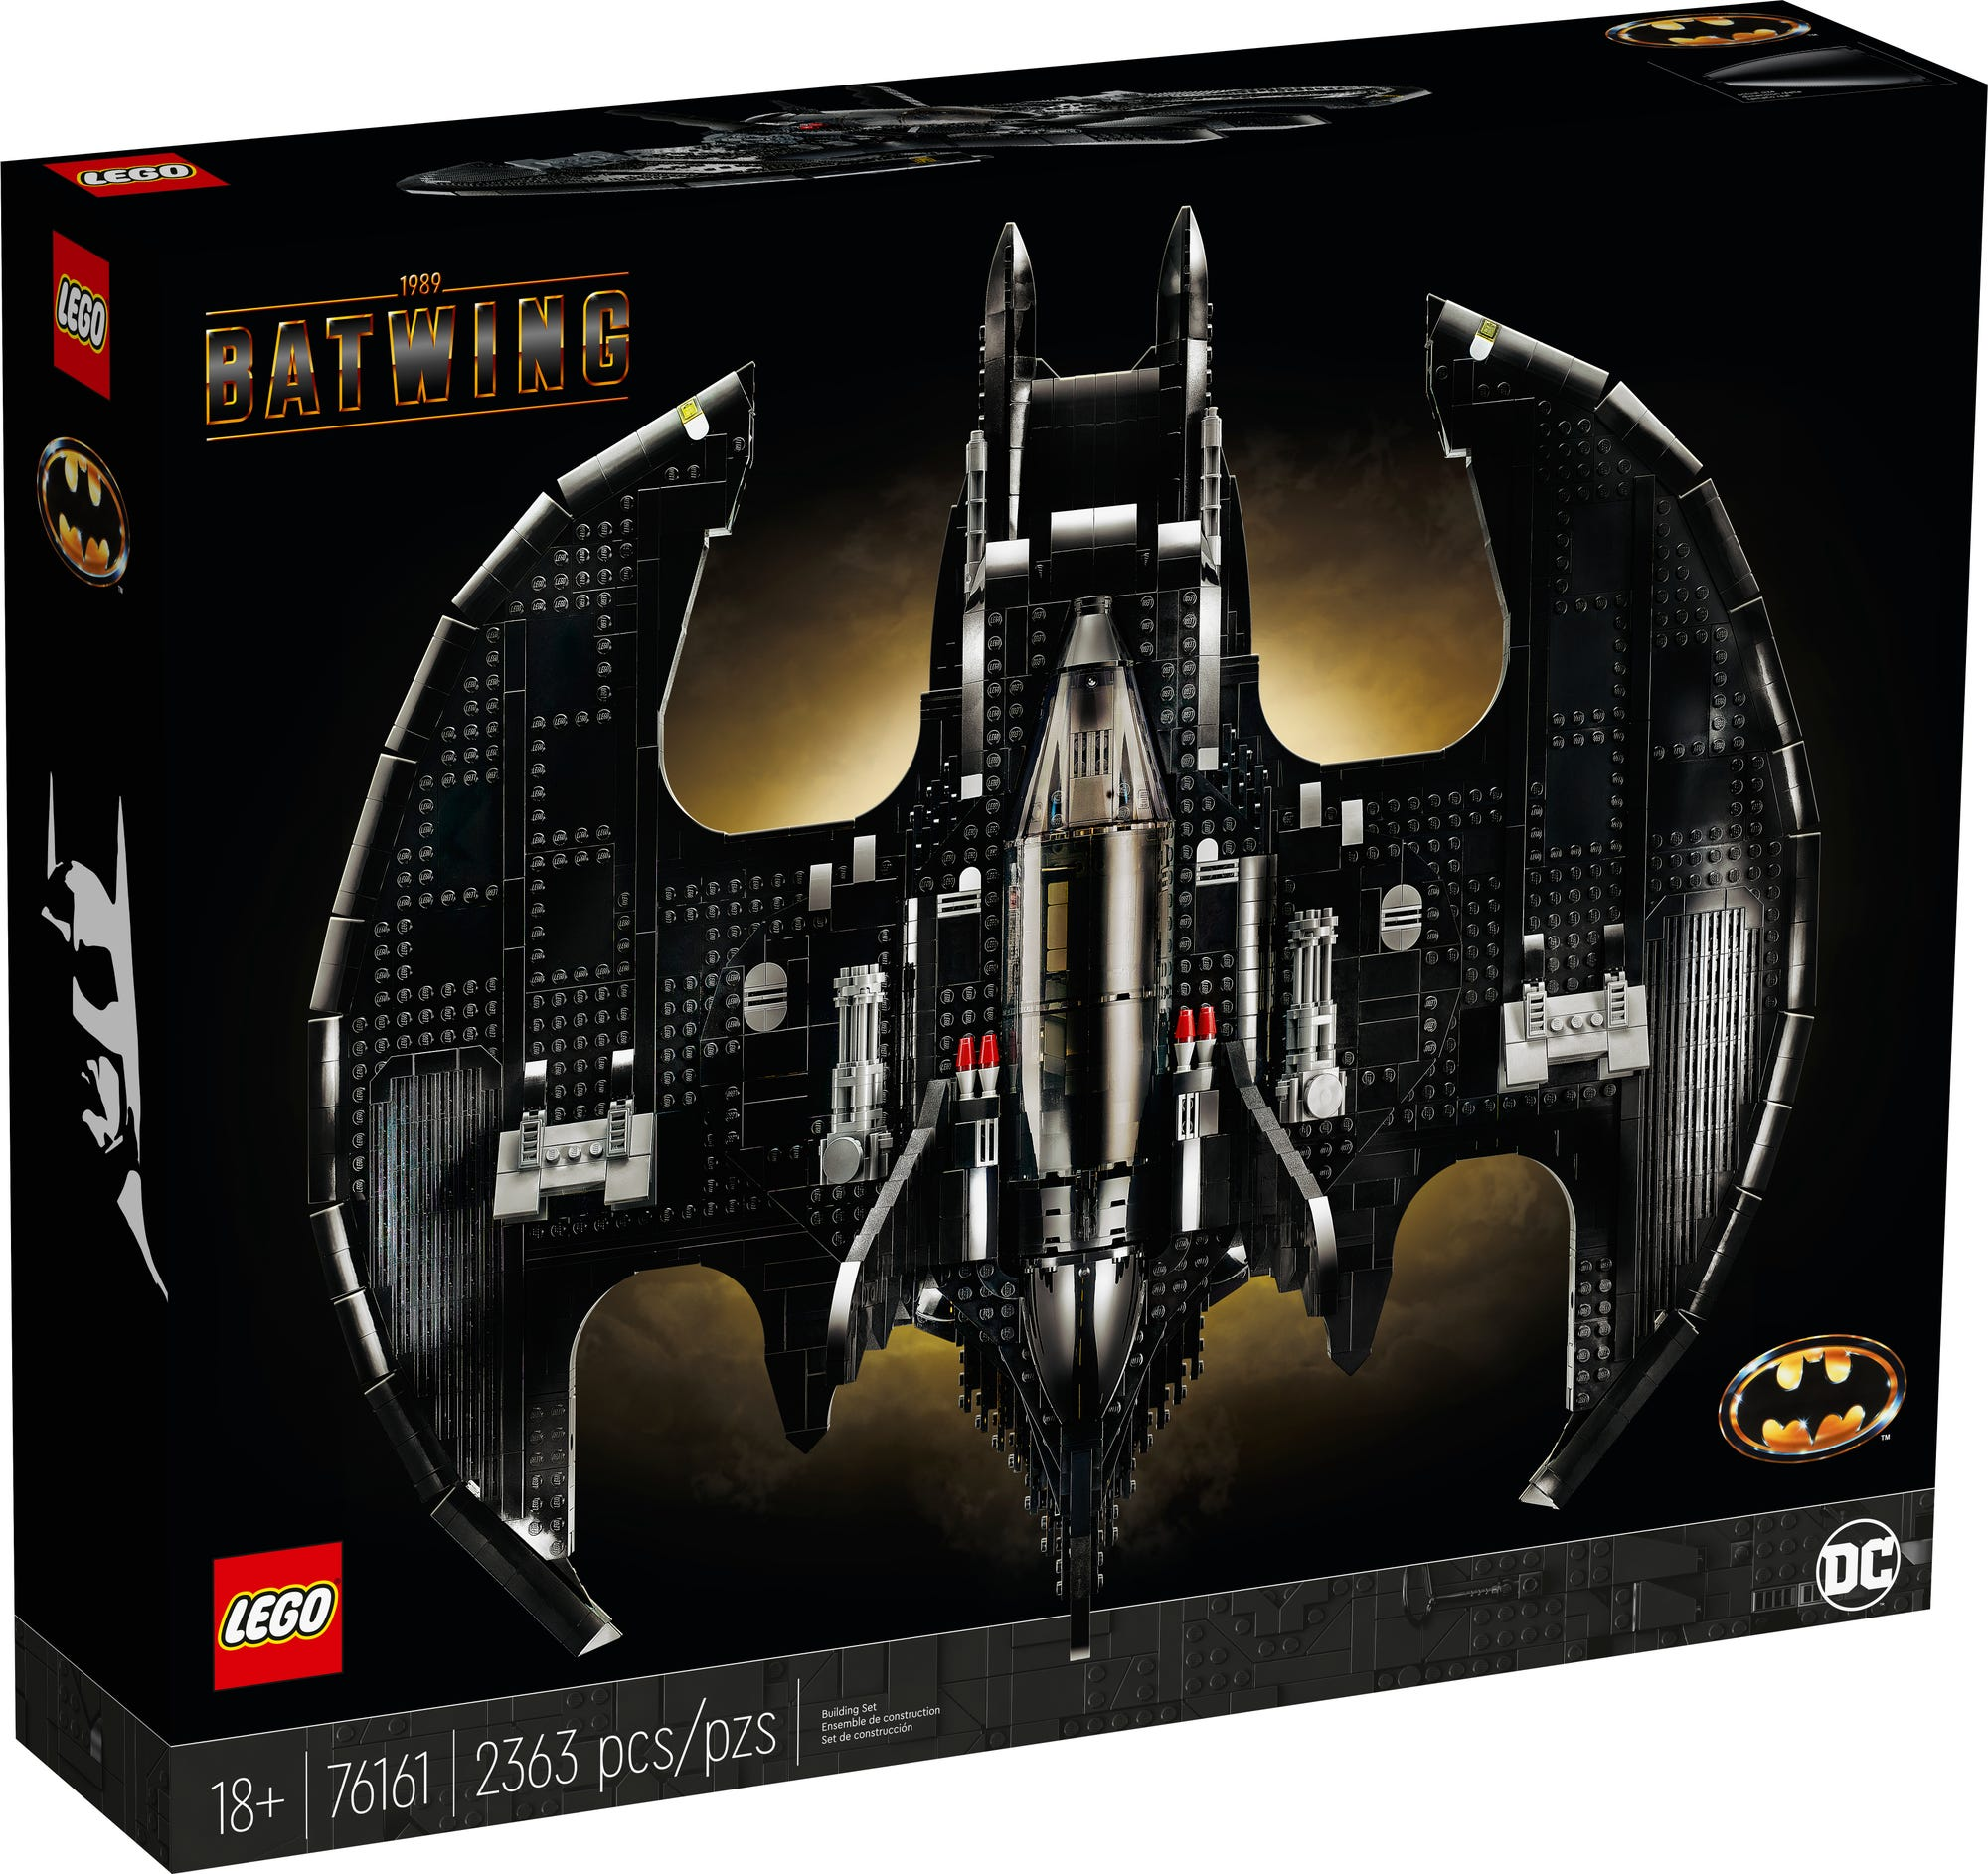 LEGO 76161 1989 Batwing (Box Vorderseite)